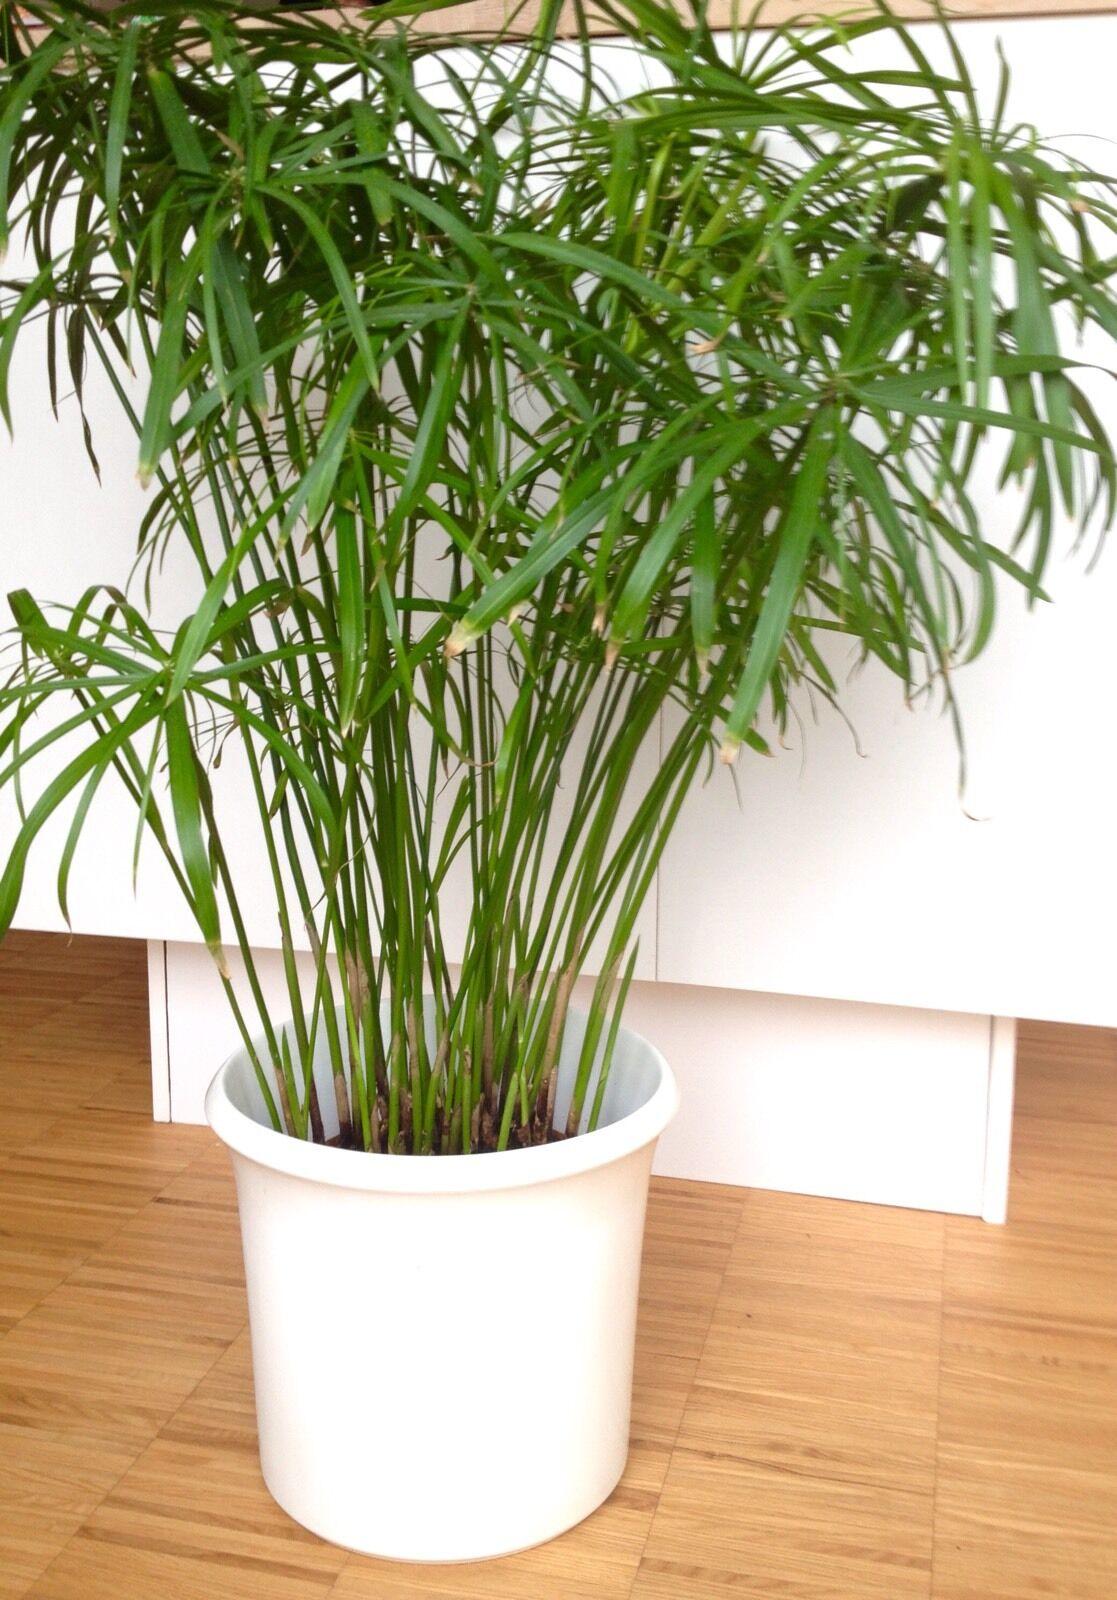 cyperus alternifolius luftbefeuchter katzen gras zyper zyperngras ableger eur 4 30 picclick de. Black Bedroom Furniture Sets. Home Design Ideas